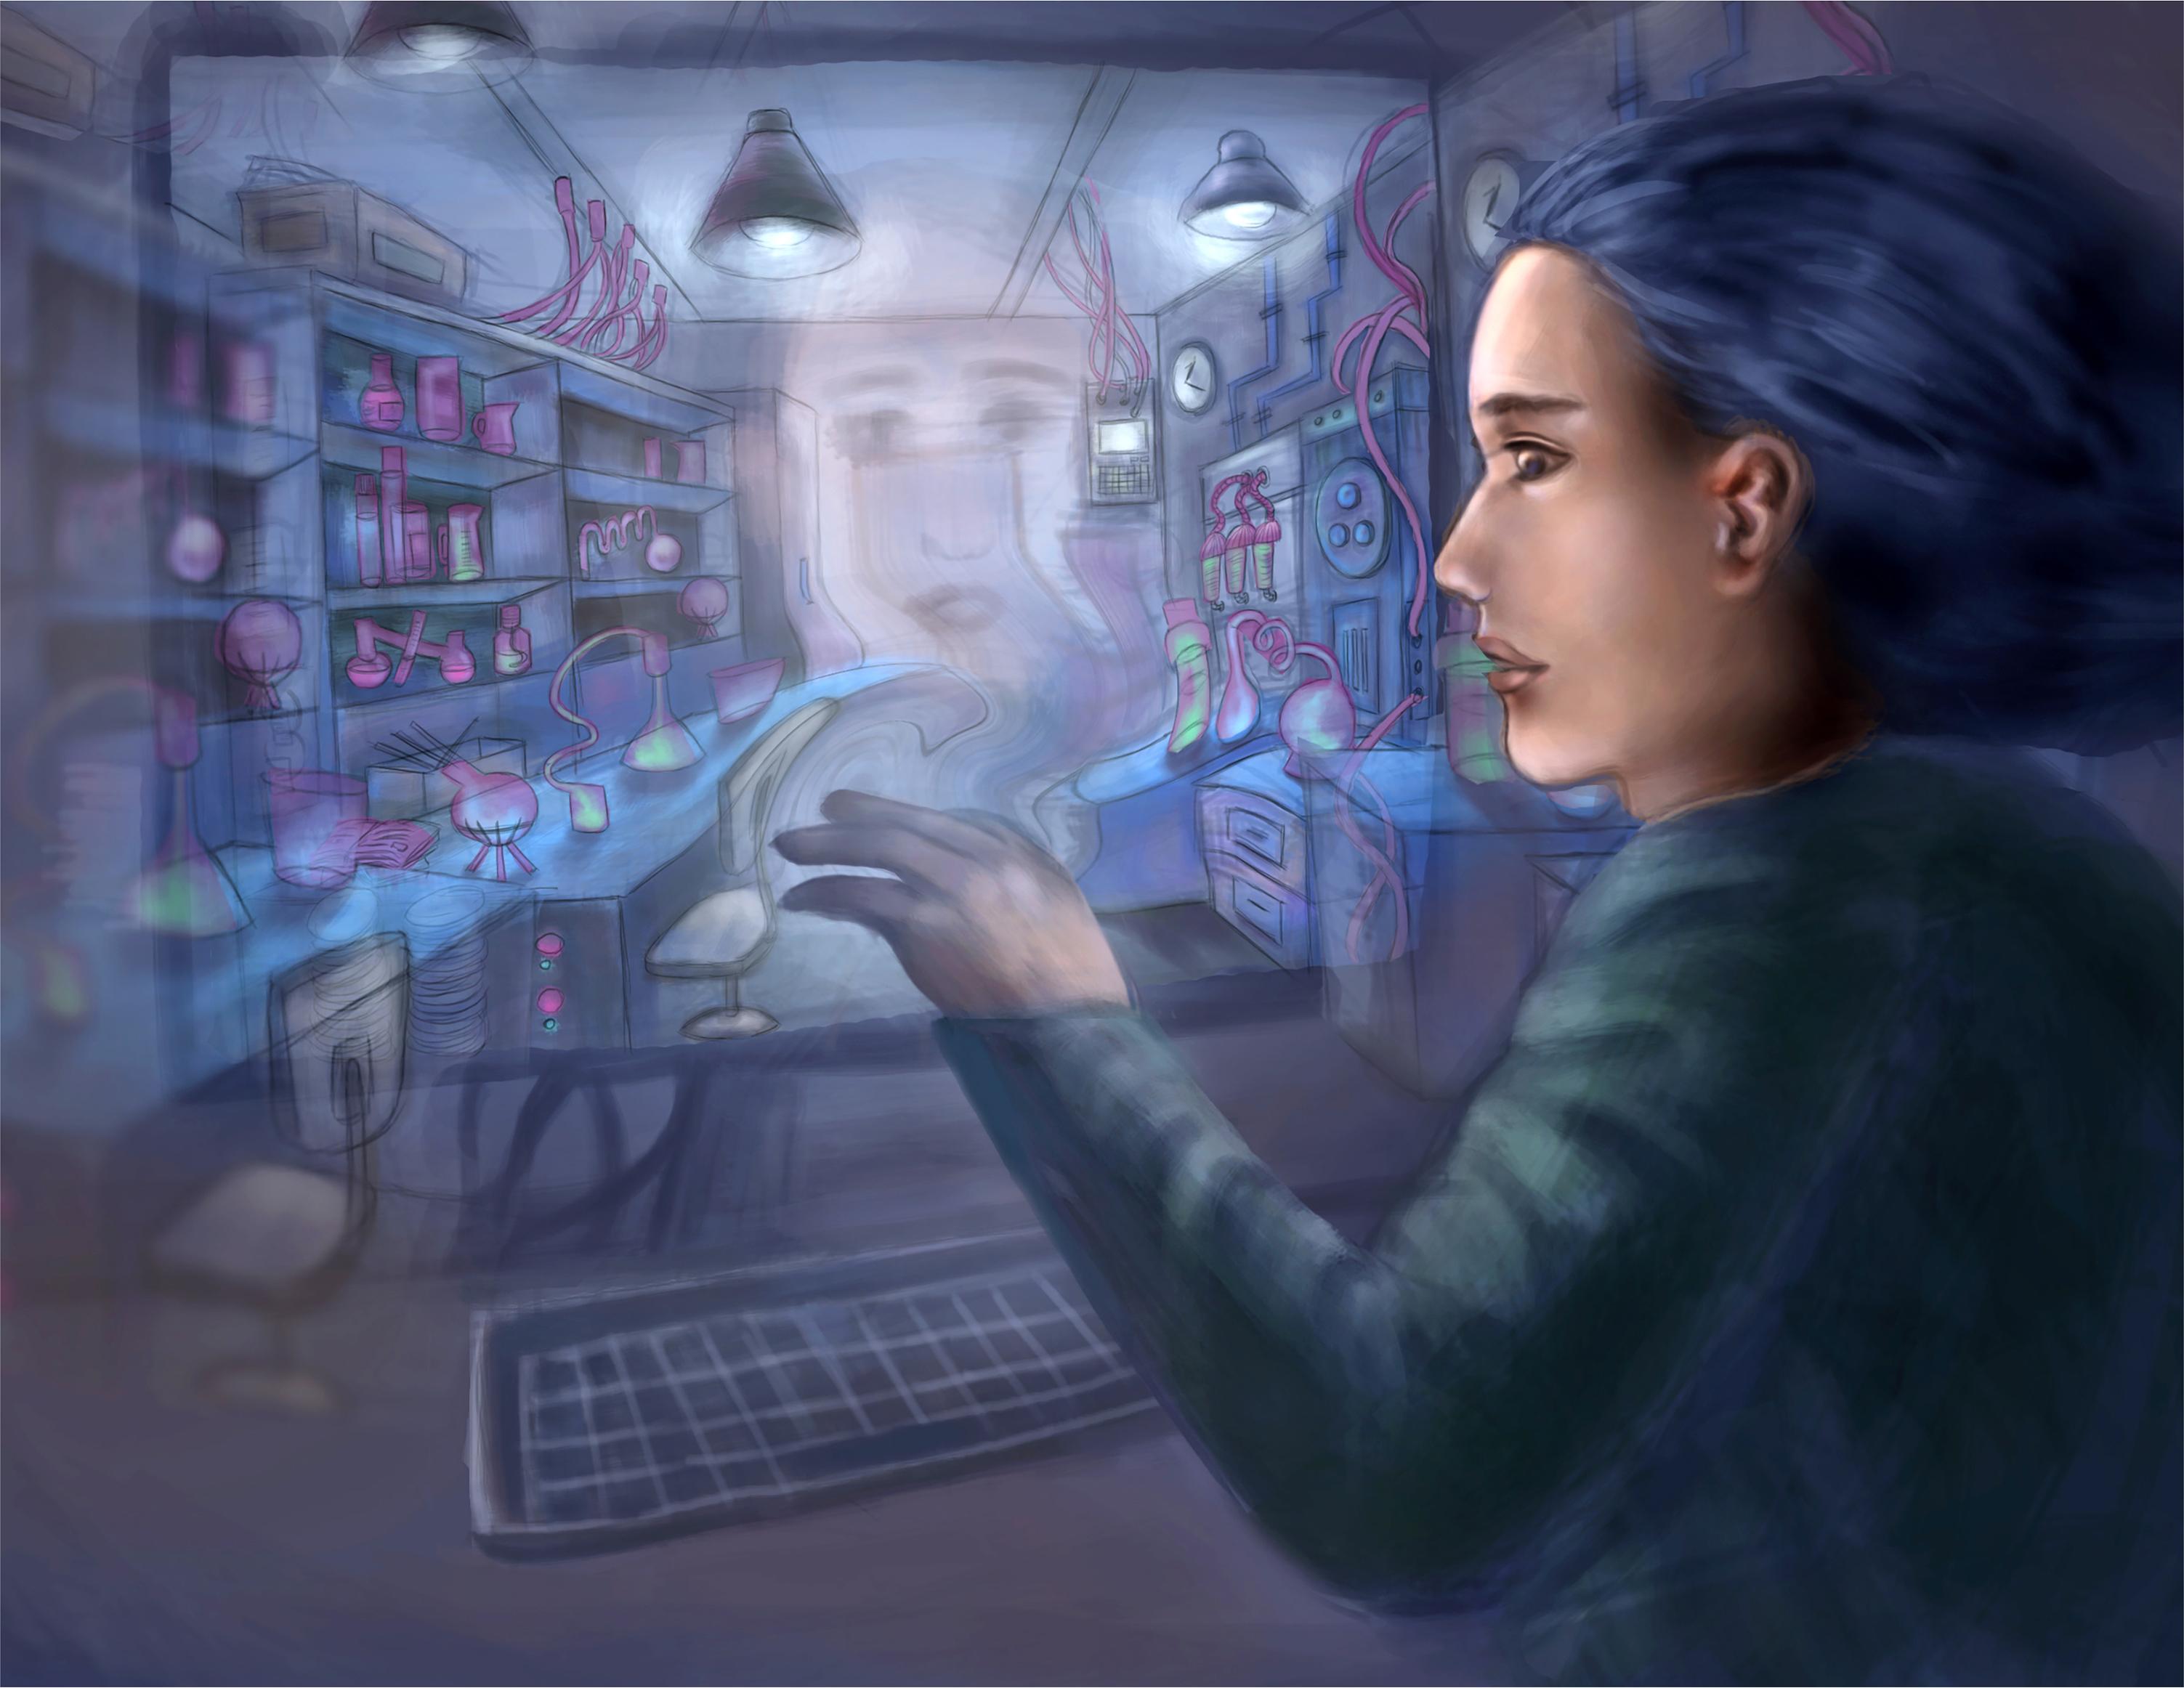 Into the Virtual Lab - a digital image by Jingyu Zhang